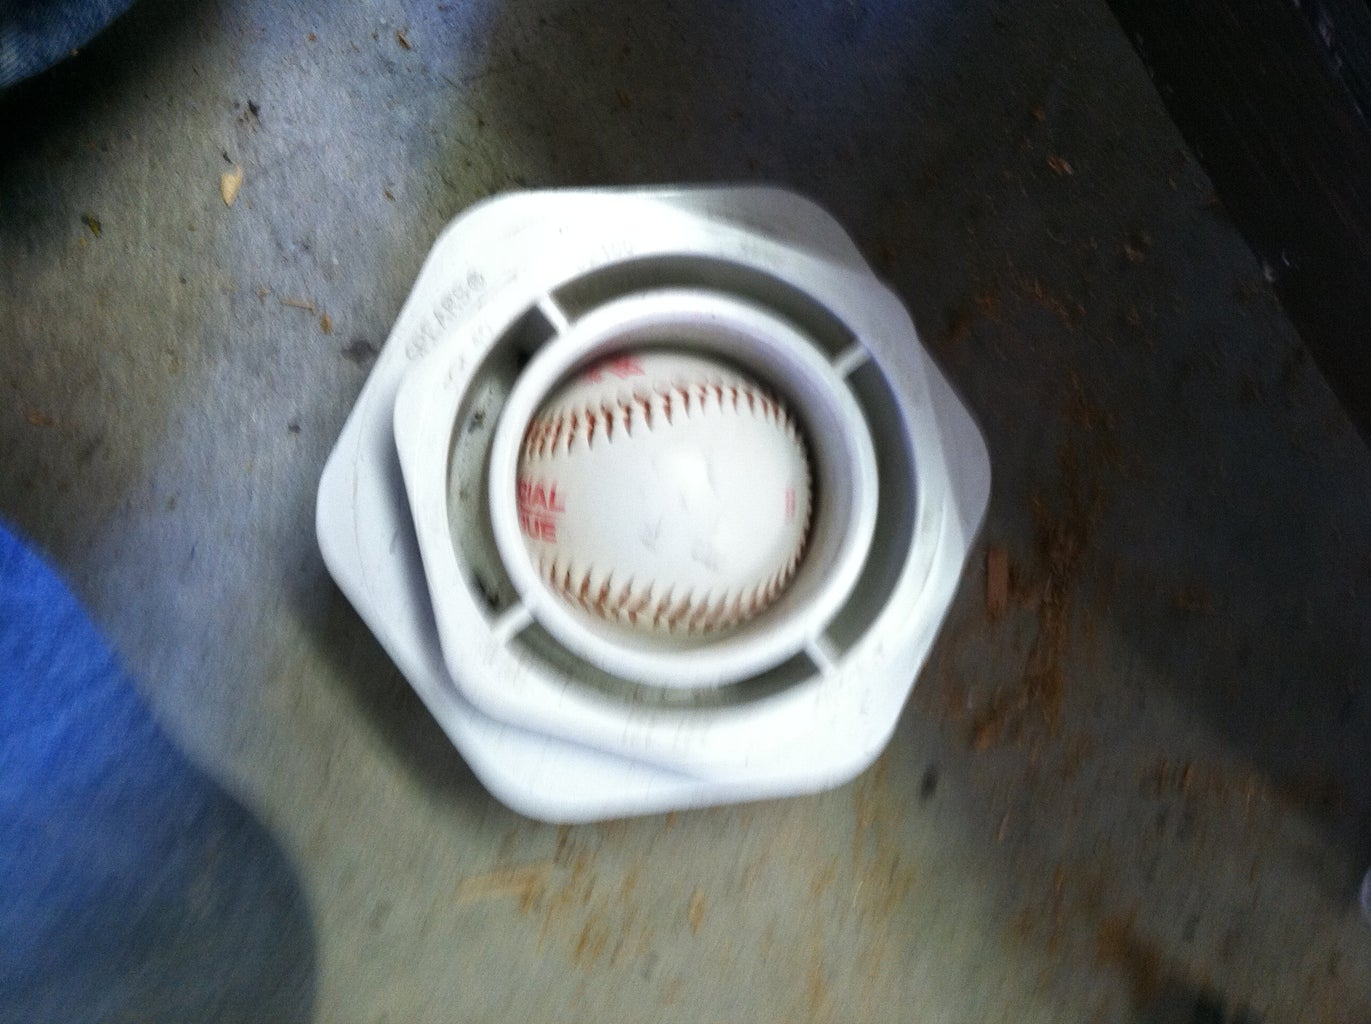 Drilling Baseballs